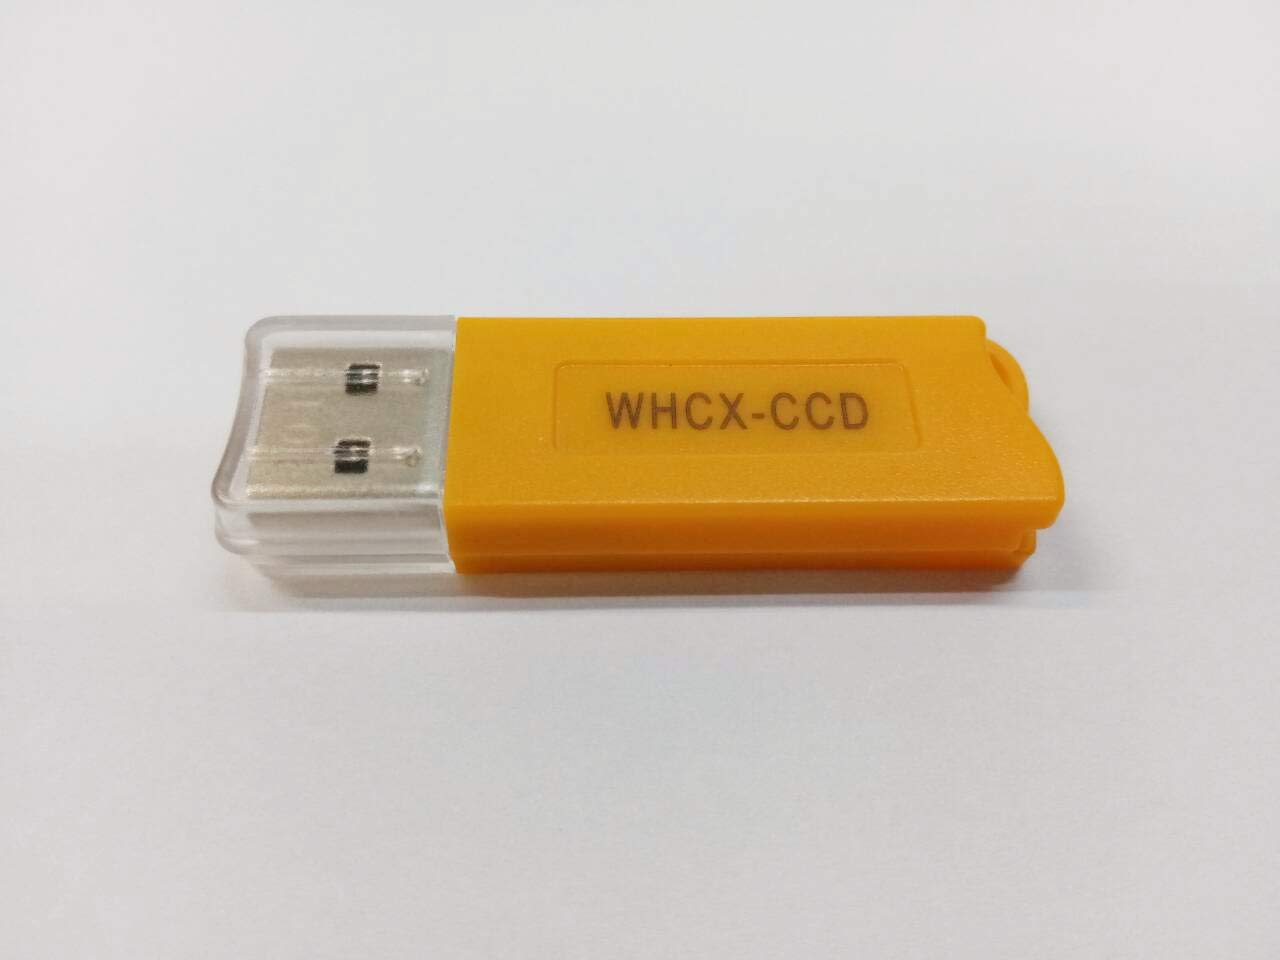 USB Dongle KEY// Softdog for CO2 Laser Controller System Engraver Cutter